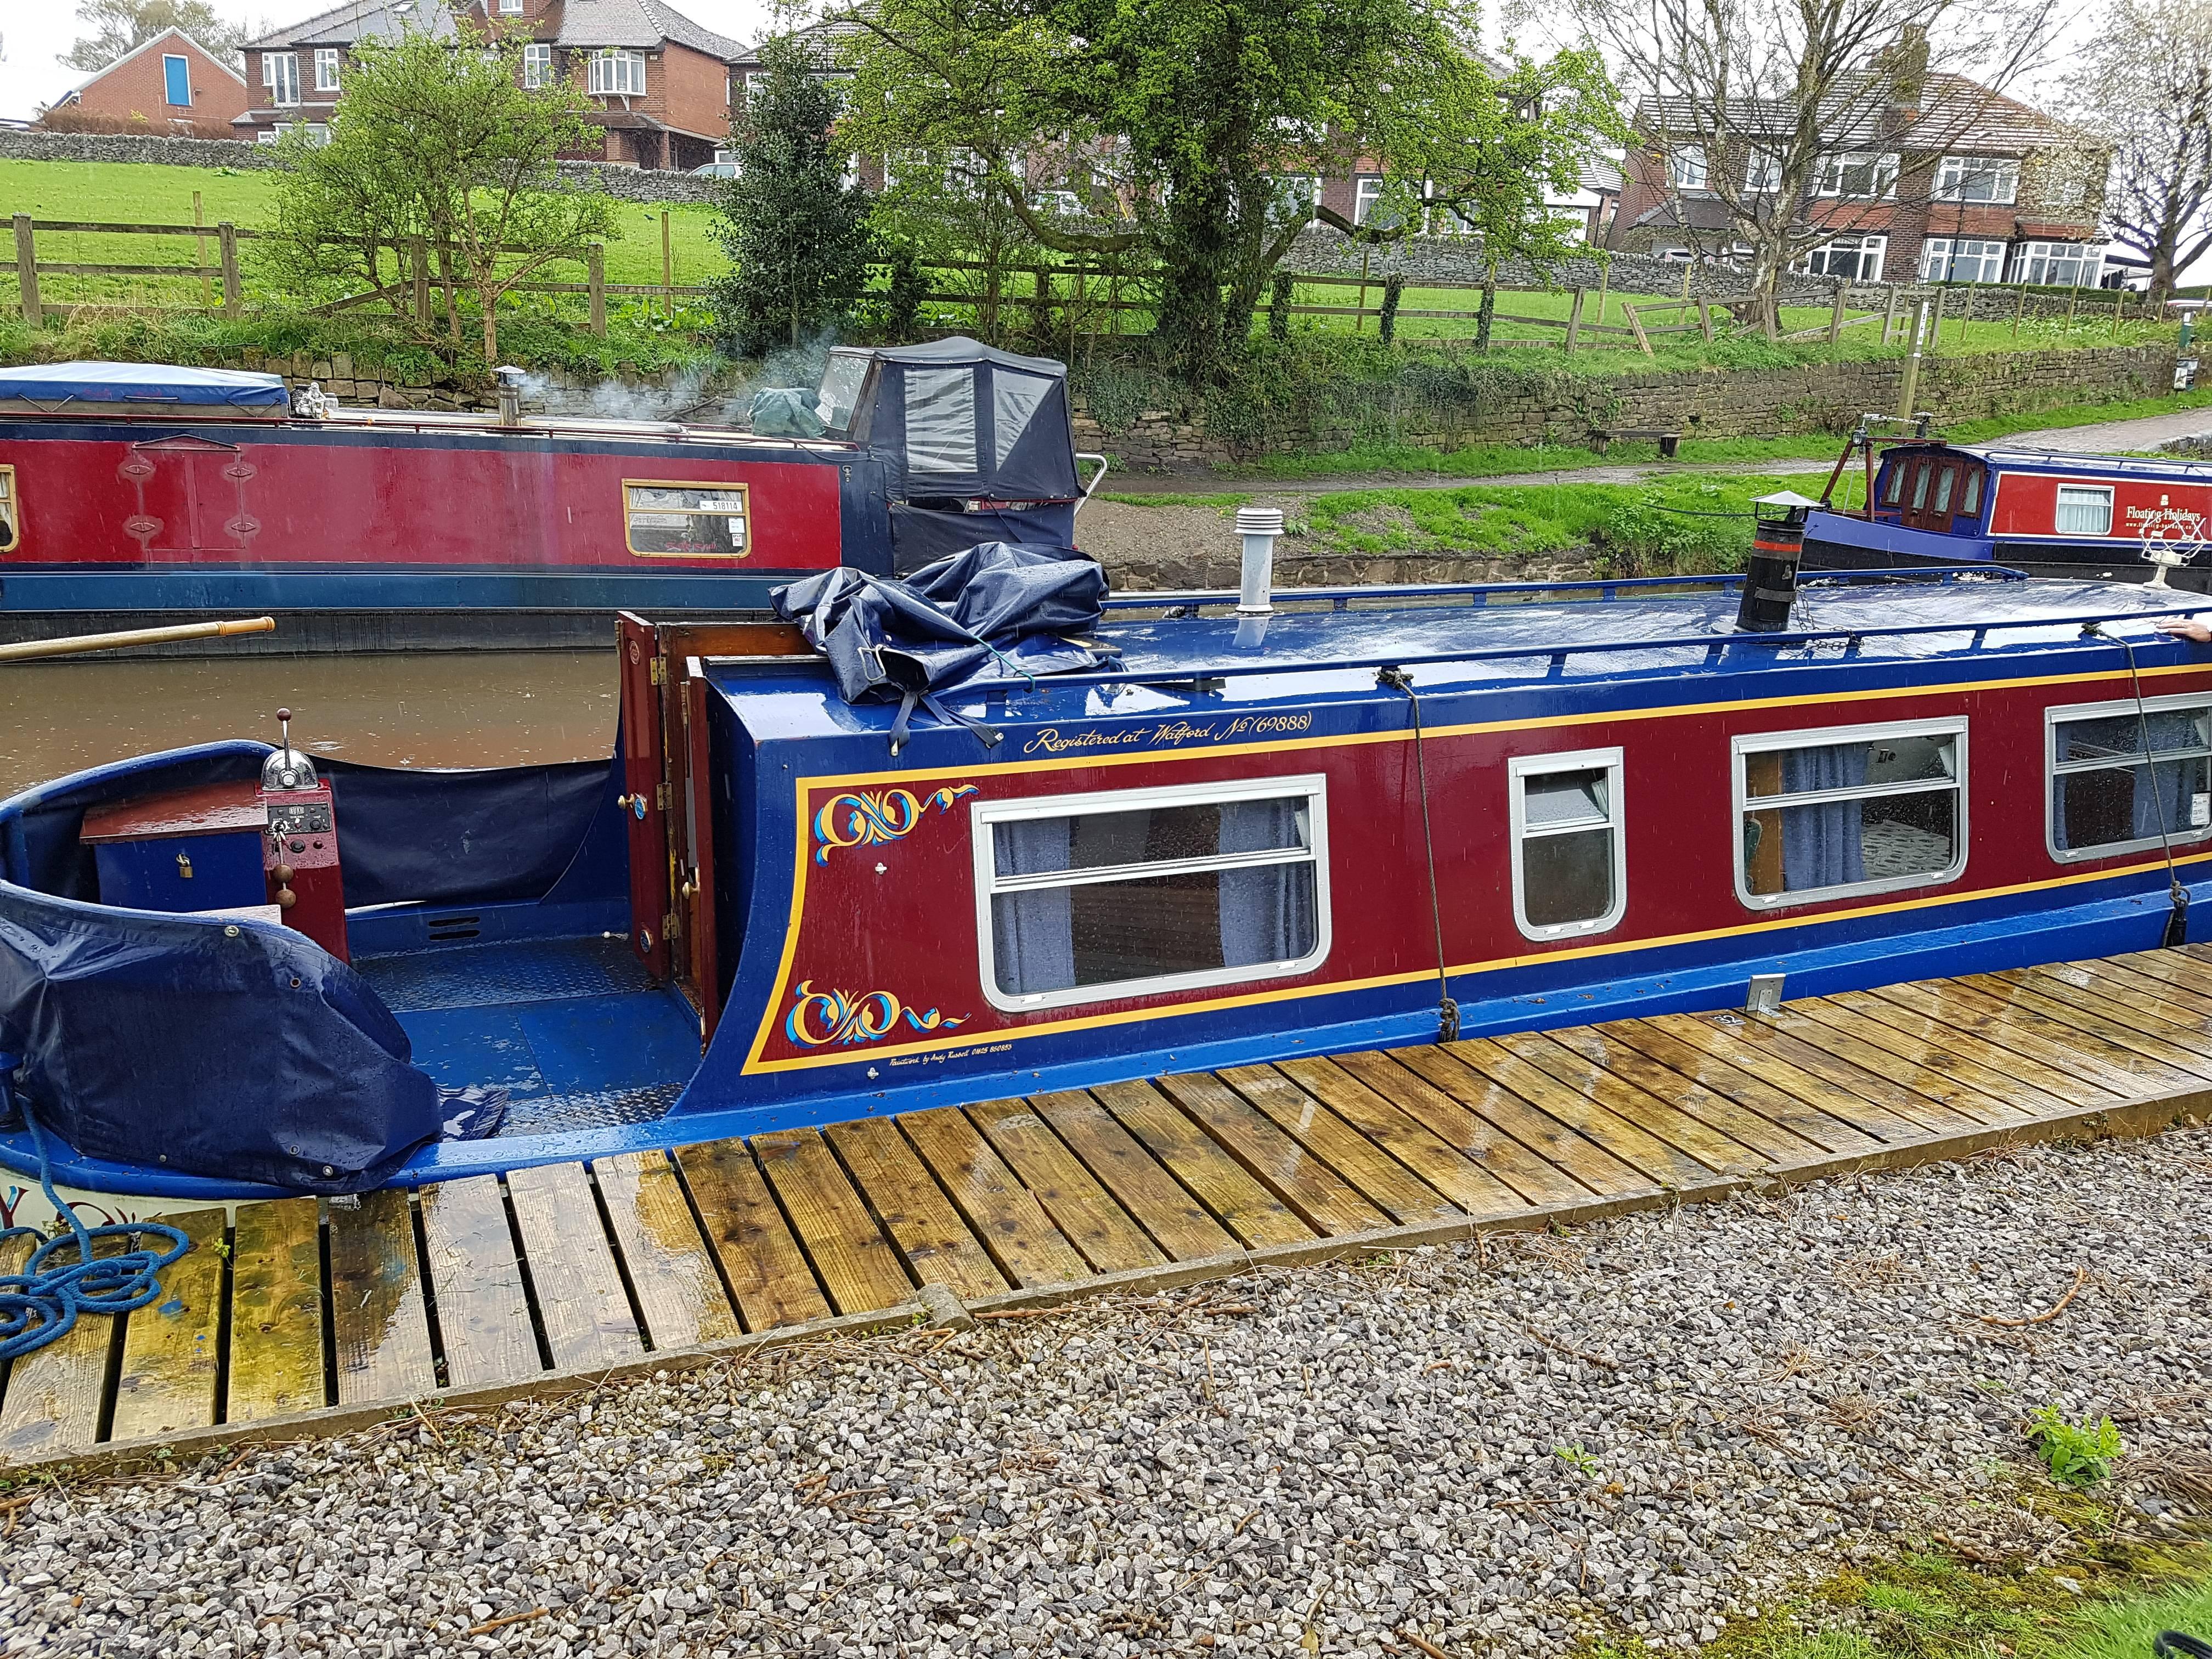 castaway moored up